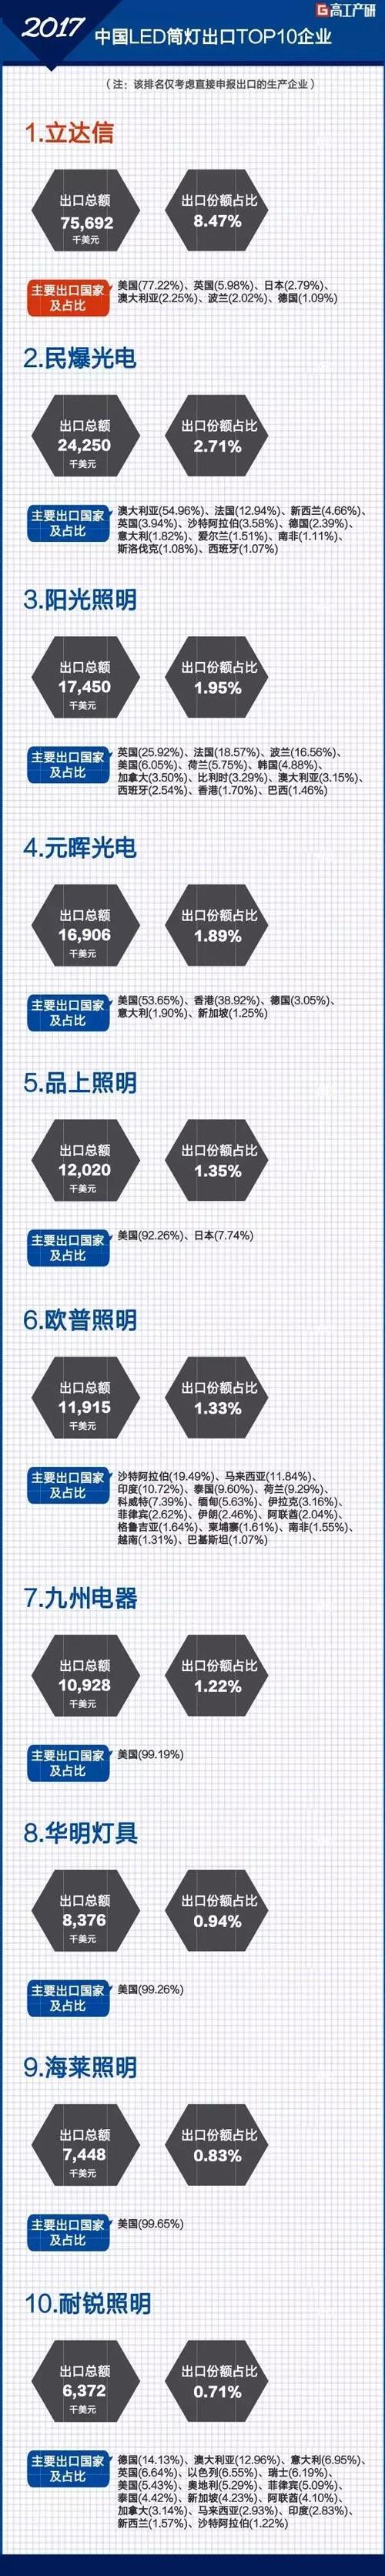 GGII:2017年中国LED筒灯出口十大企业1